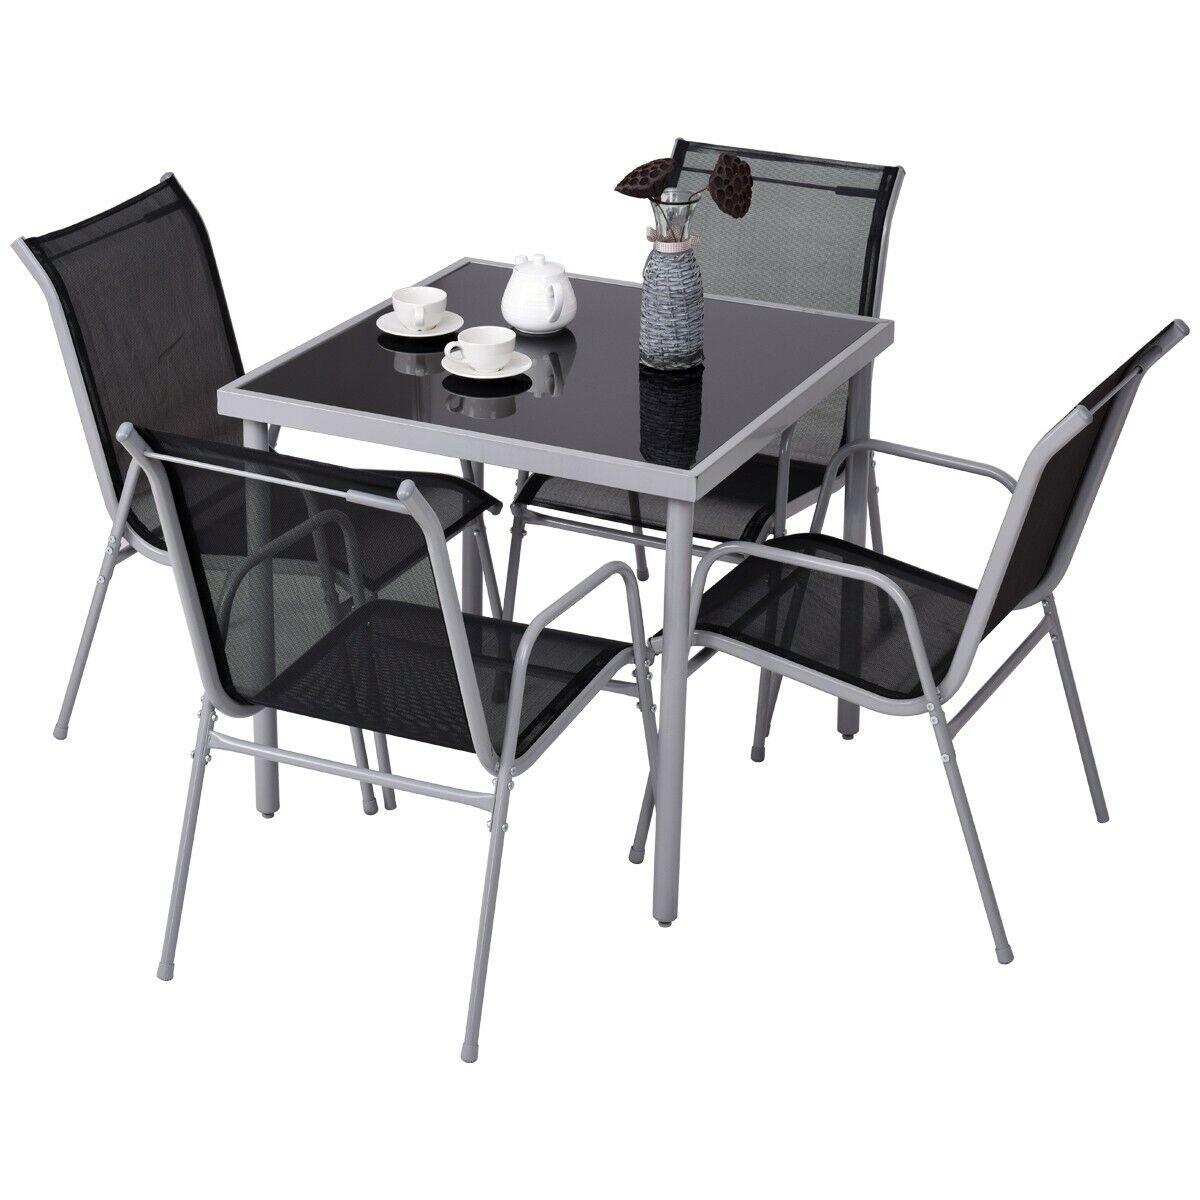 Set 1 tavolo + 4 sedie giardino balcone prato Casa pranzo ...